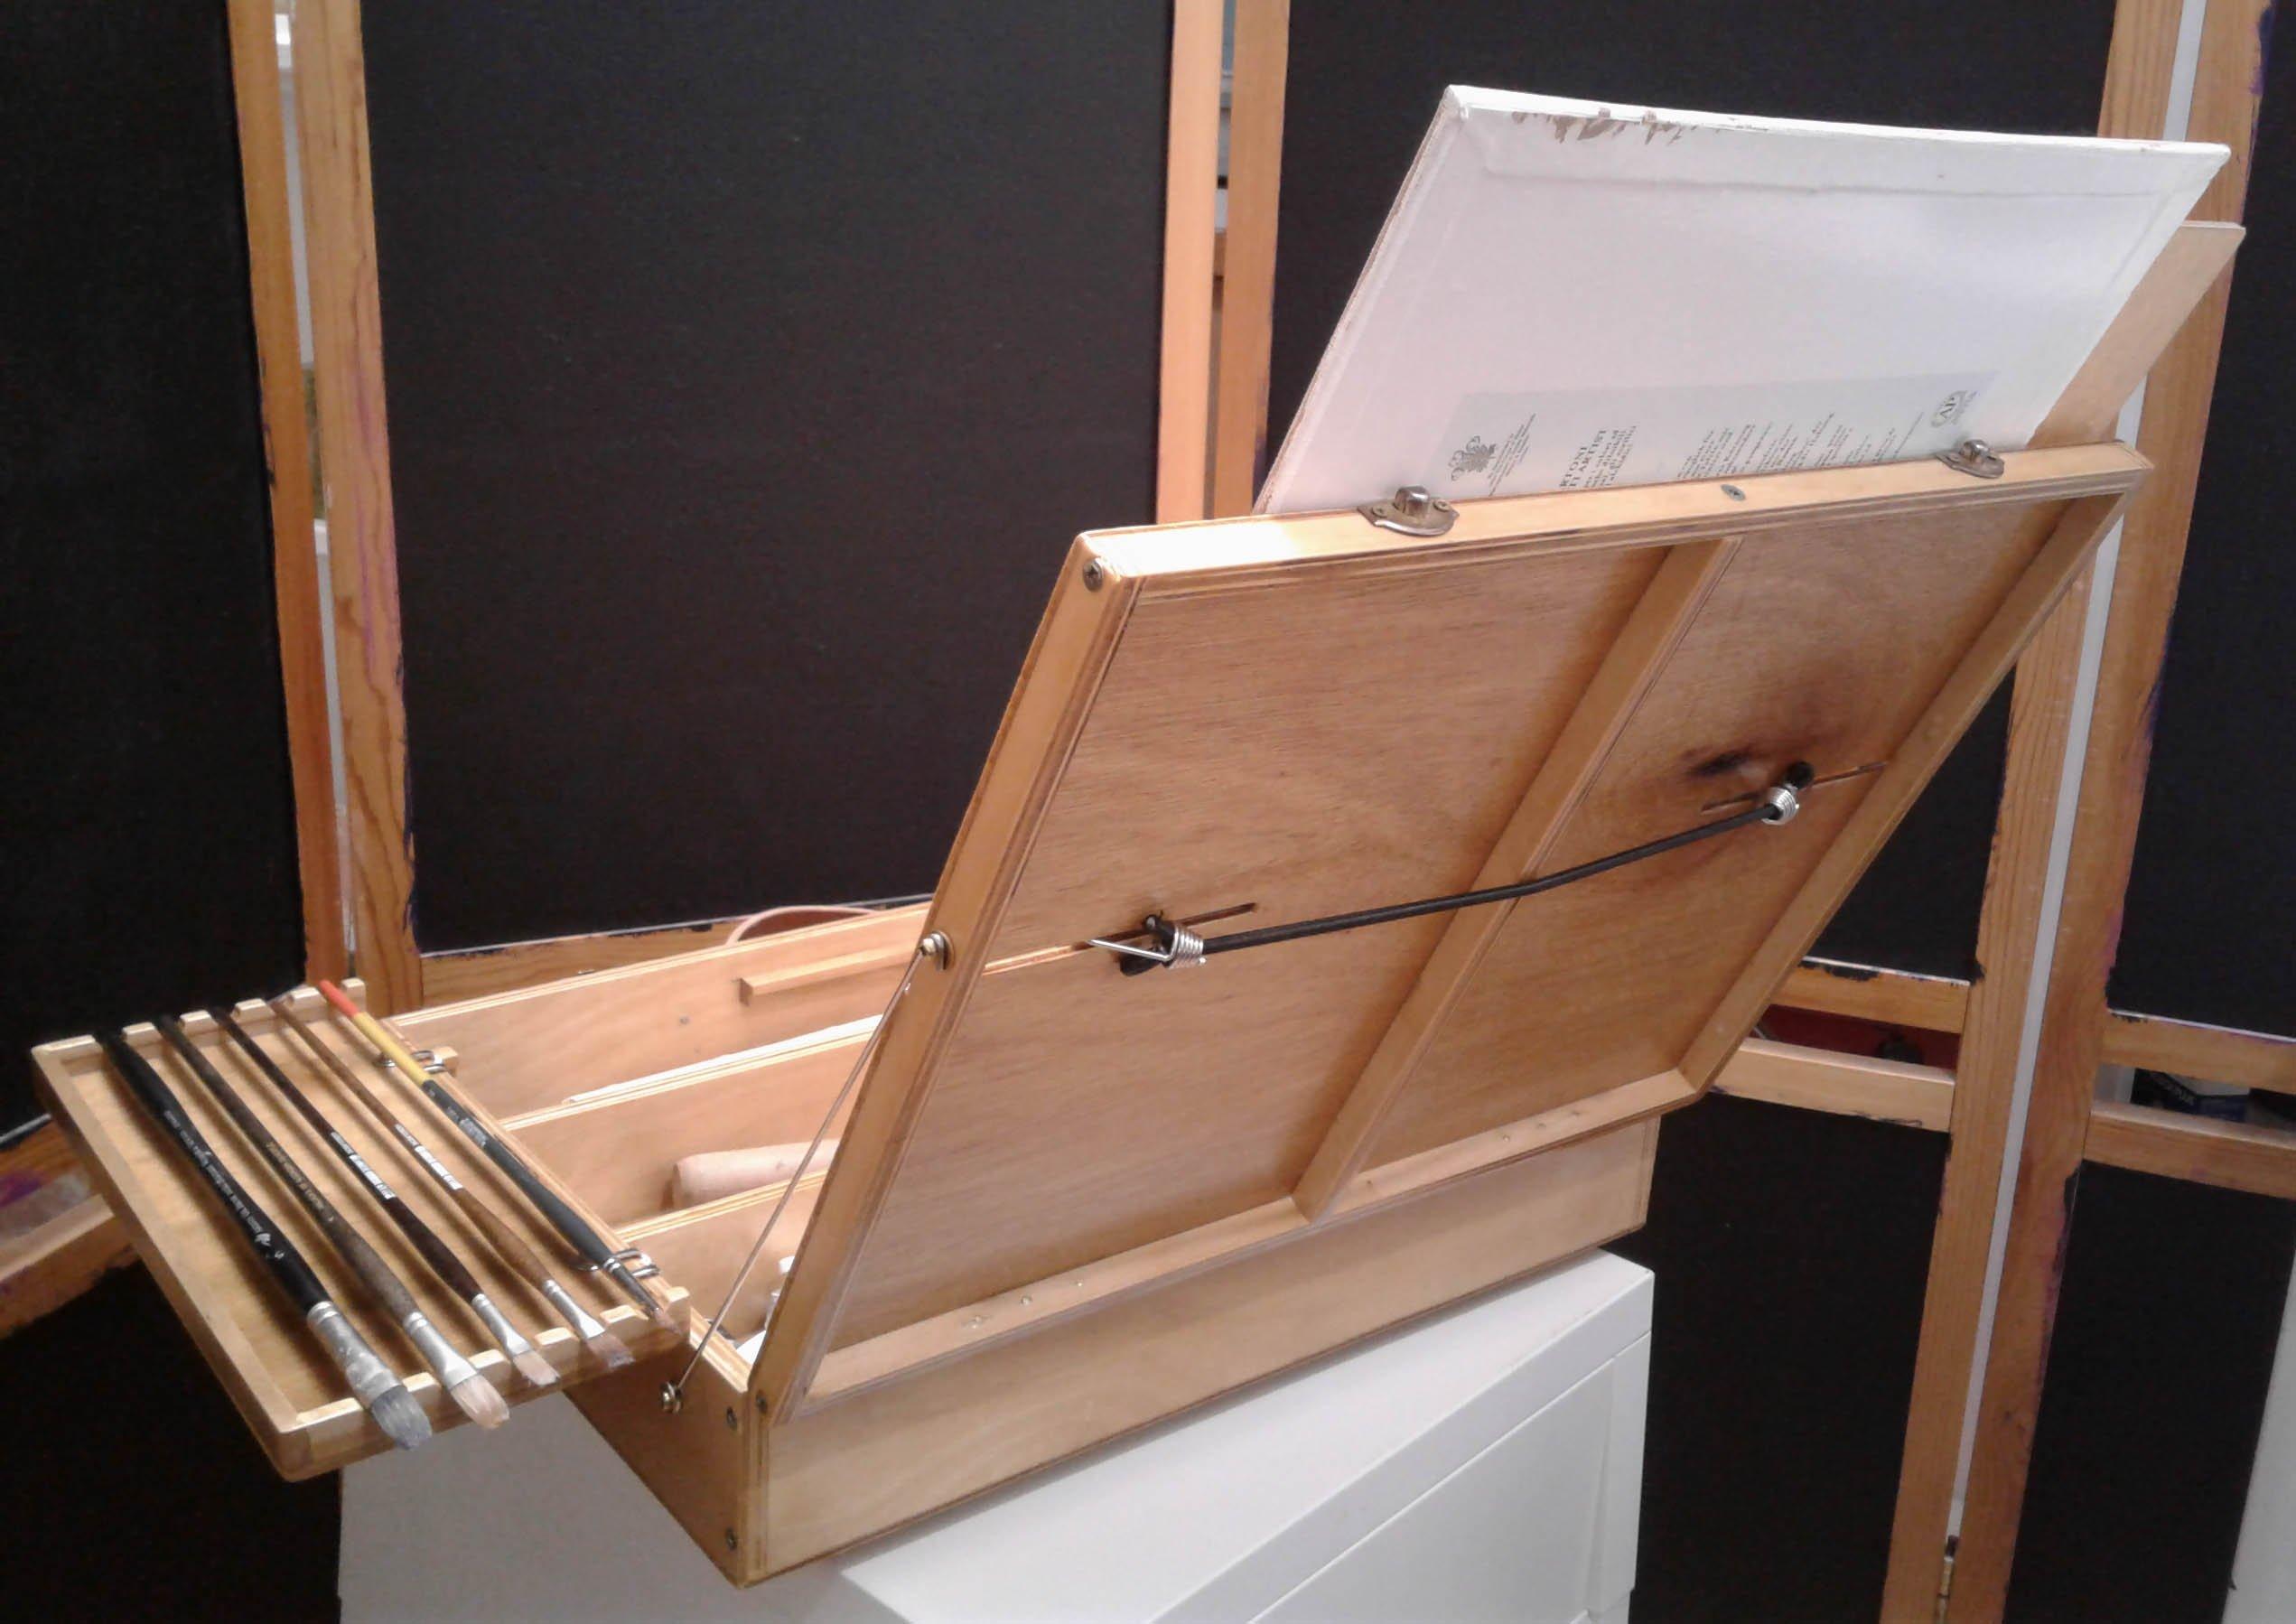 New Pochade Box, DIY, Scrap Pieces Wood